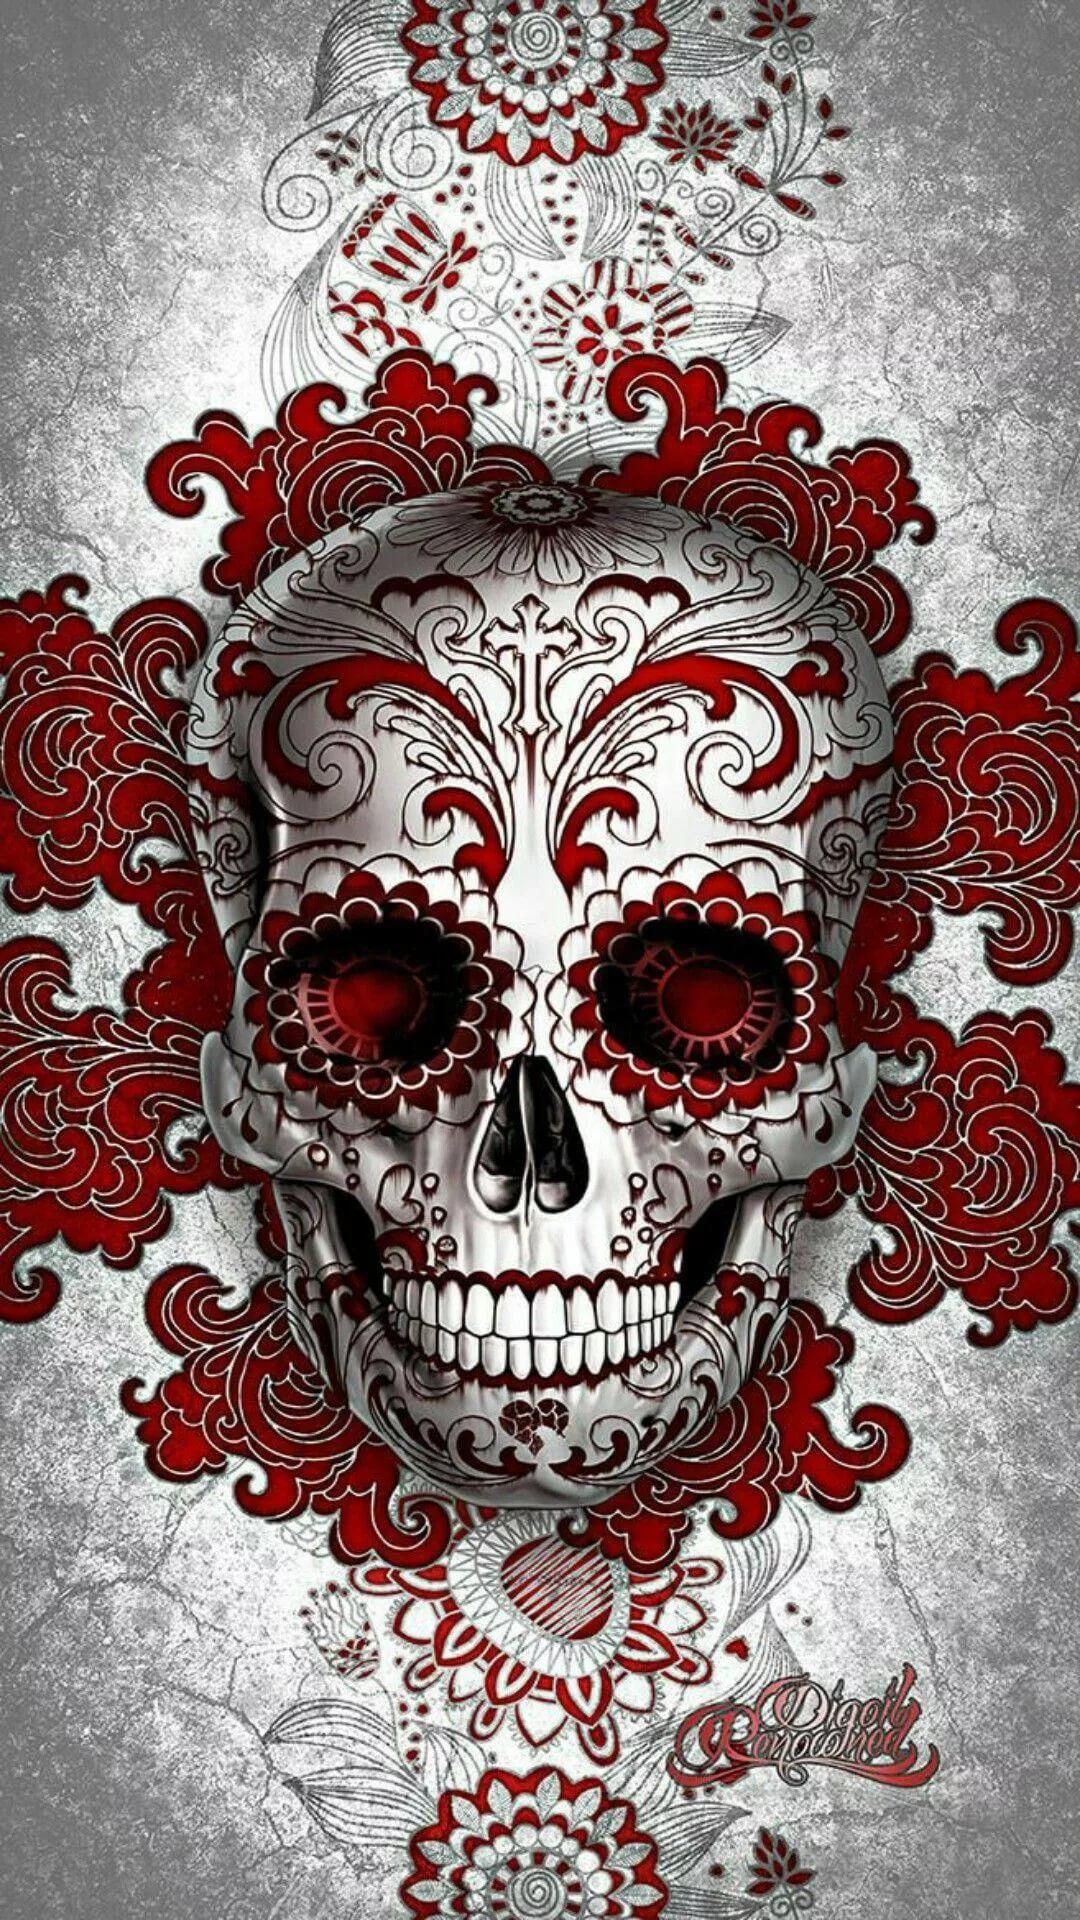 Cool Skull iPhone 7 wallpaper hd